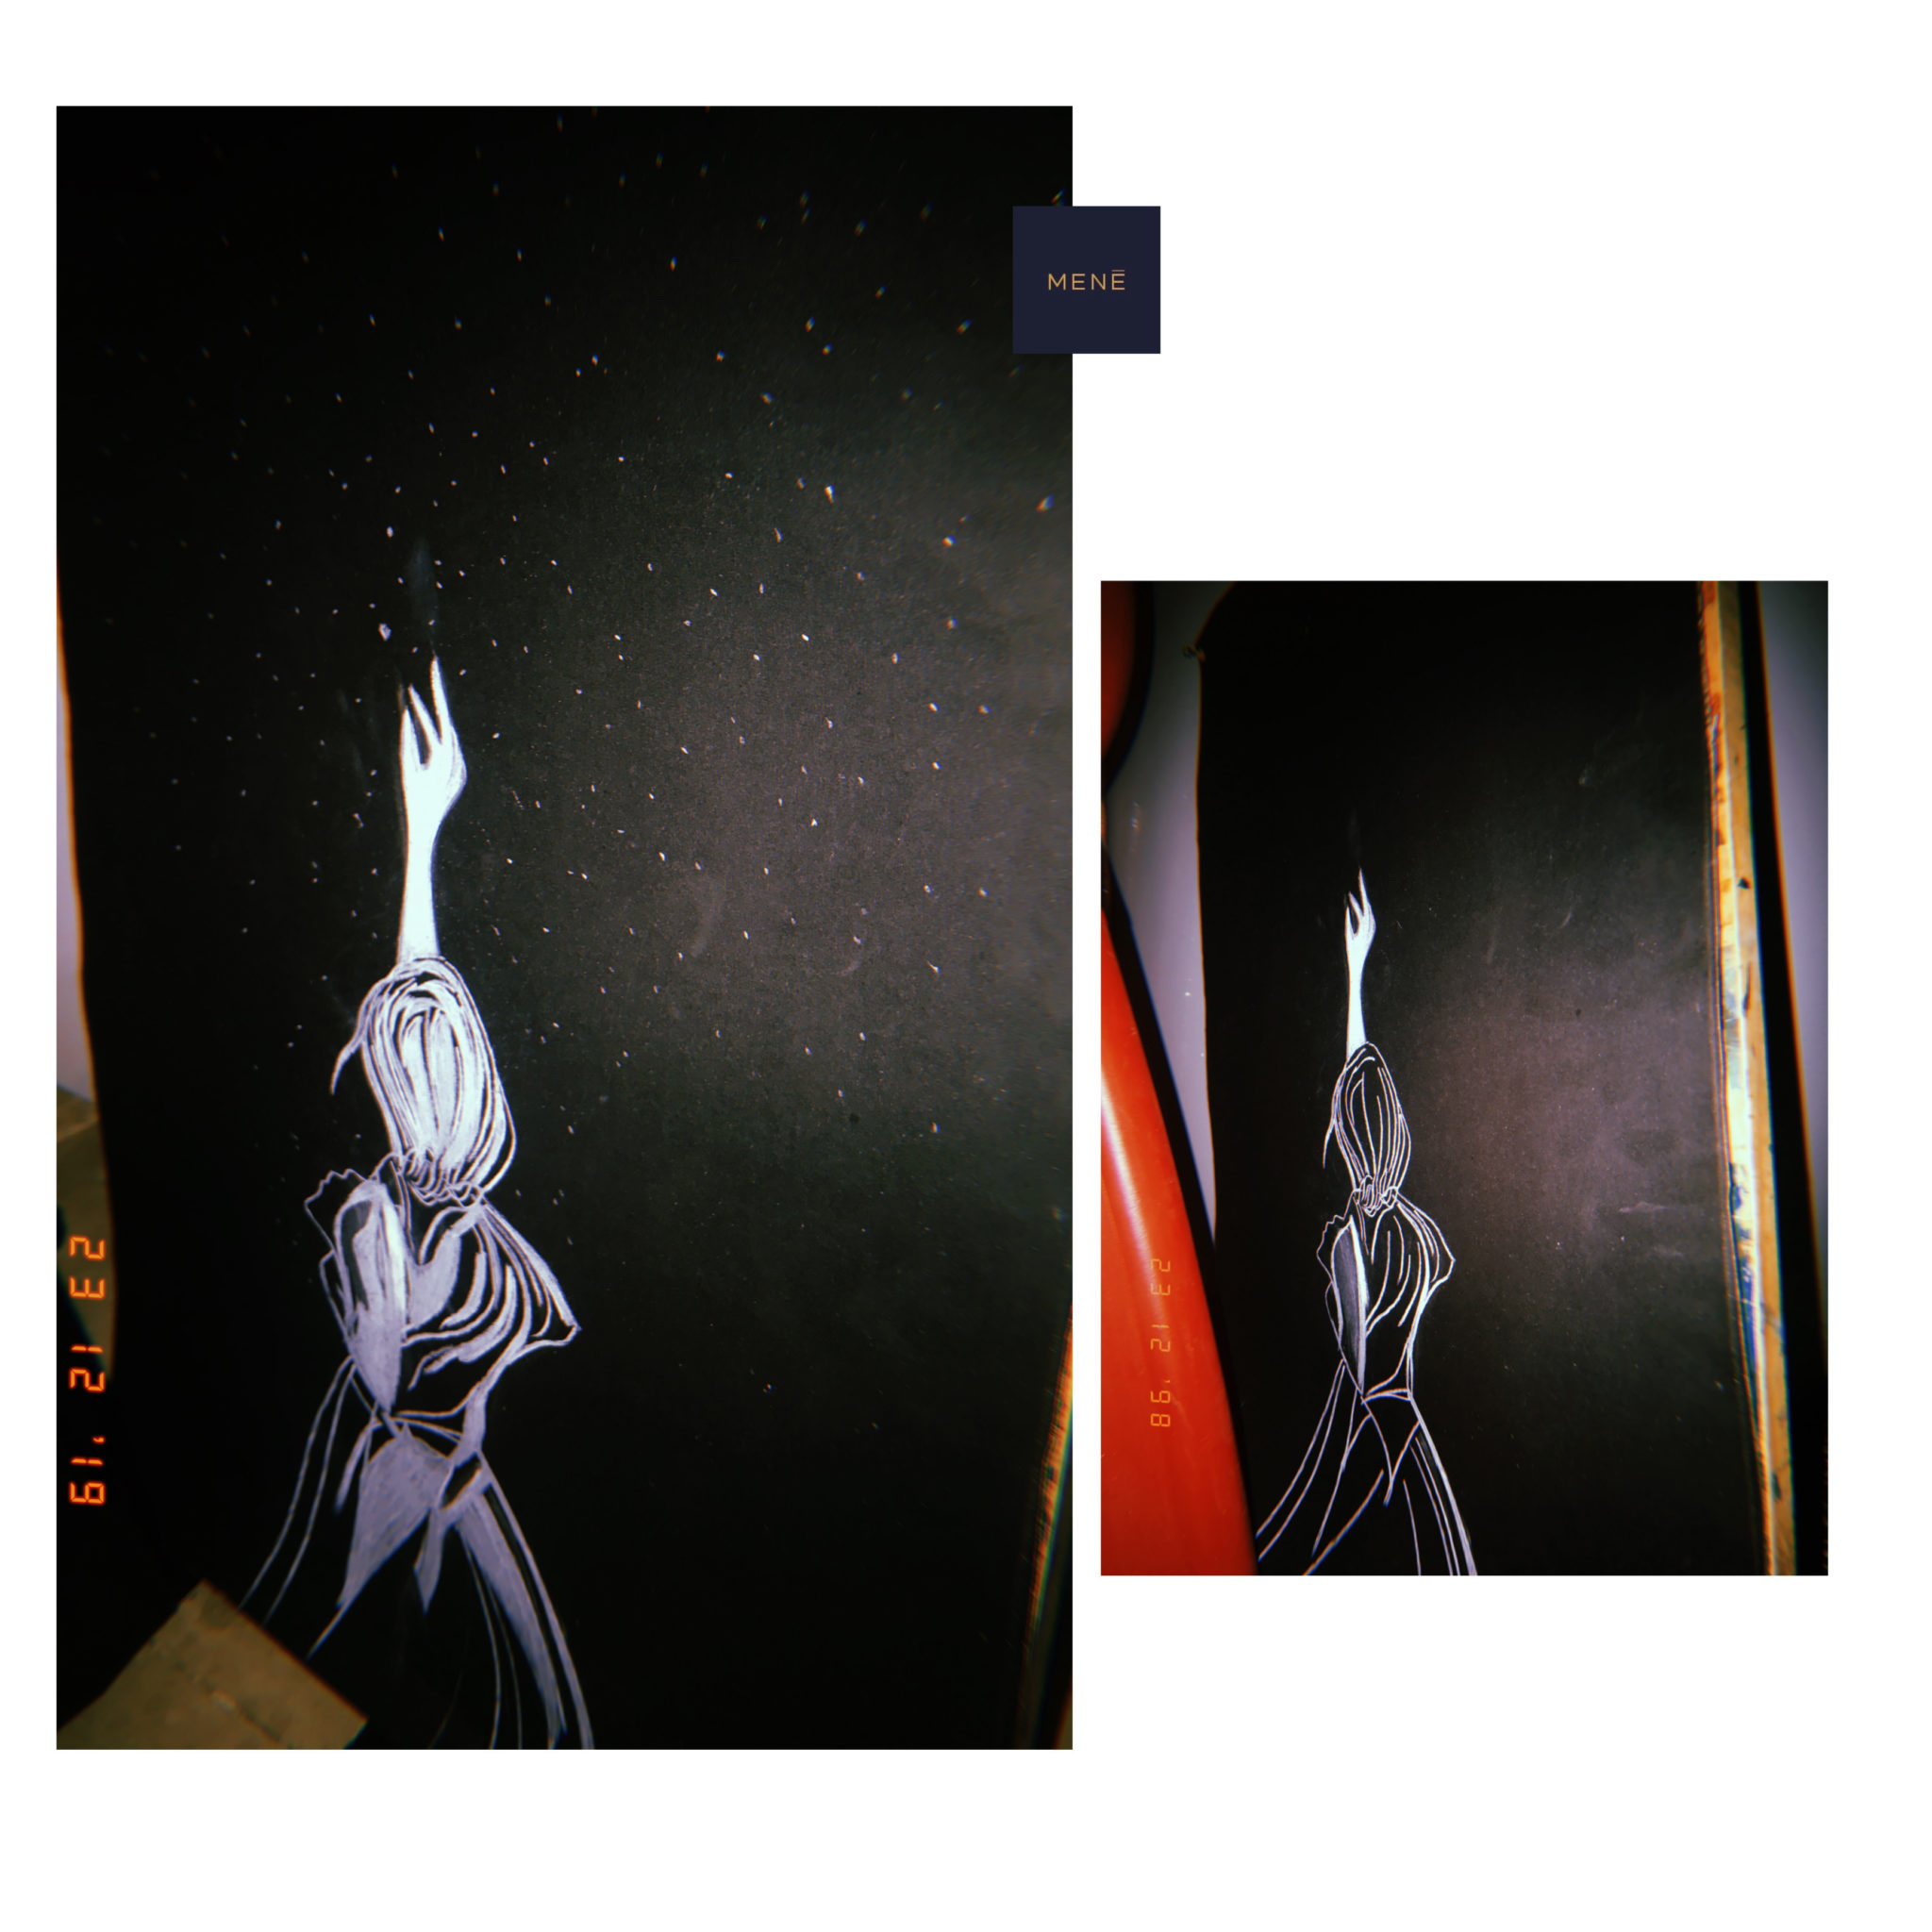 White Charcoal Art on Black Cansen 32B268E9-D737-4EEF-BC75-18824B87D987C43B8342-1F1B-41C1-BC8C-04B24